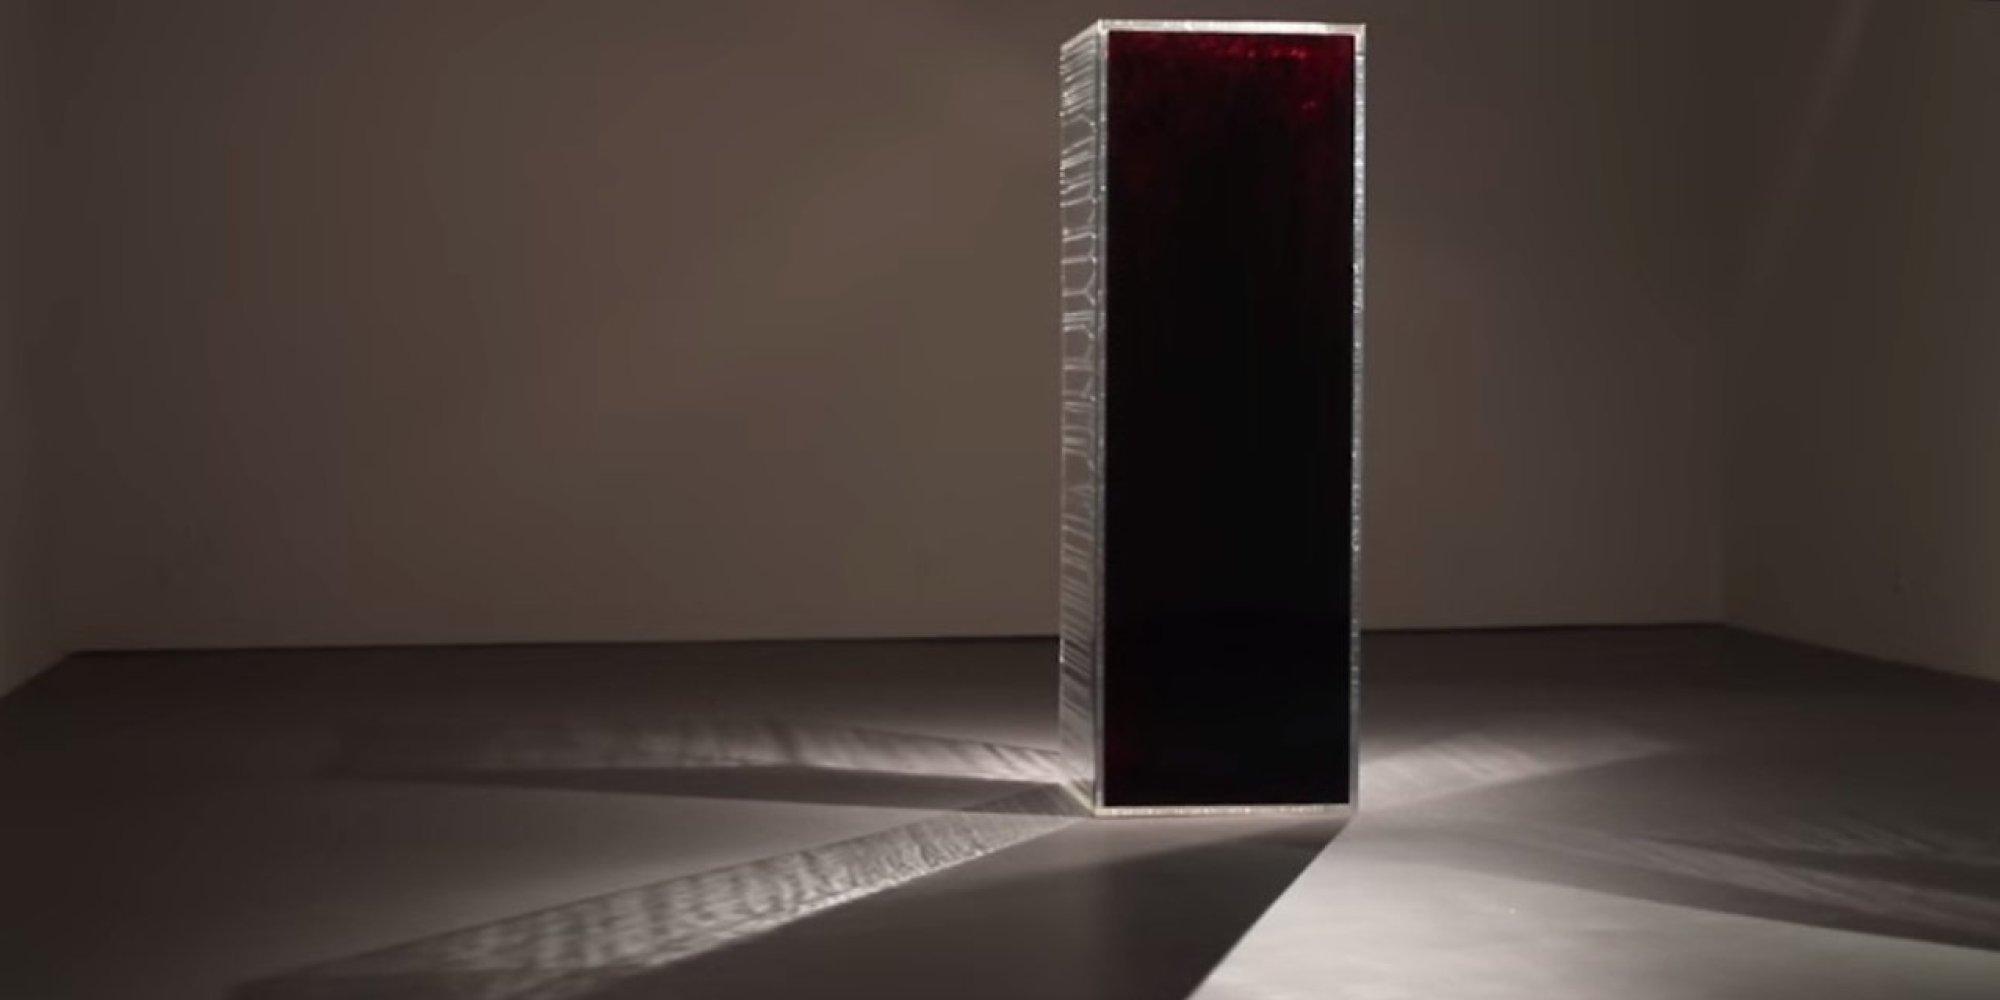 39 blood mirror 39 art installation draws attention to fda gay for Mirror installation